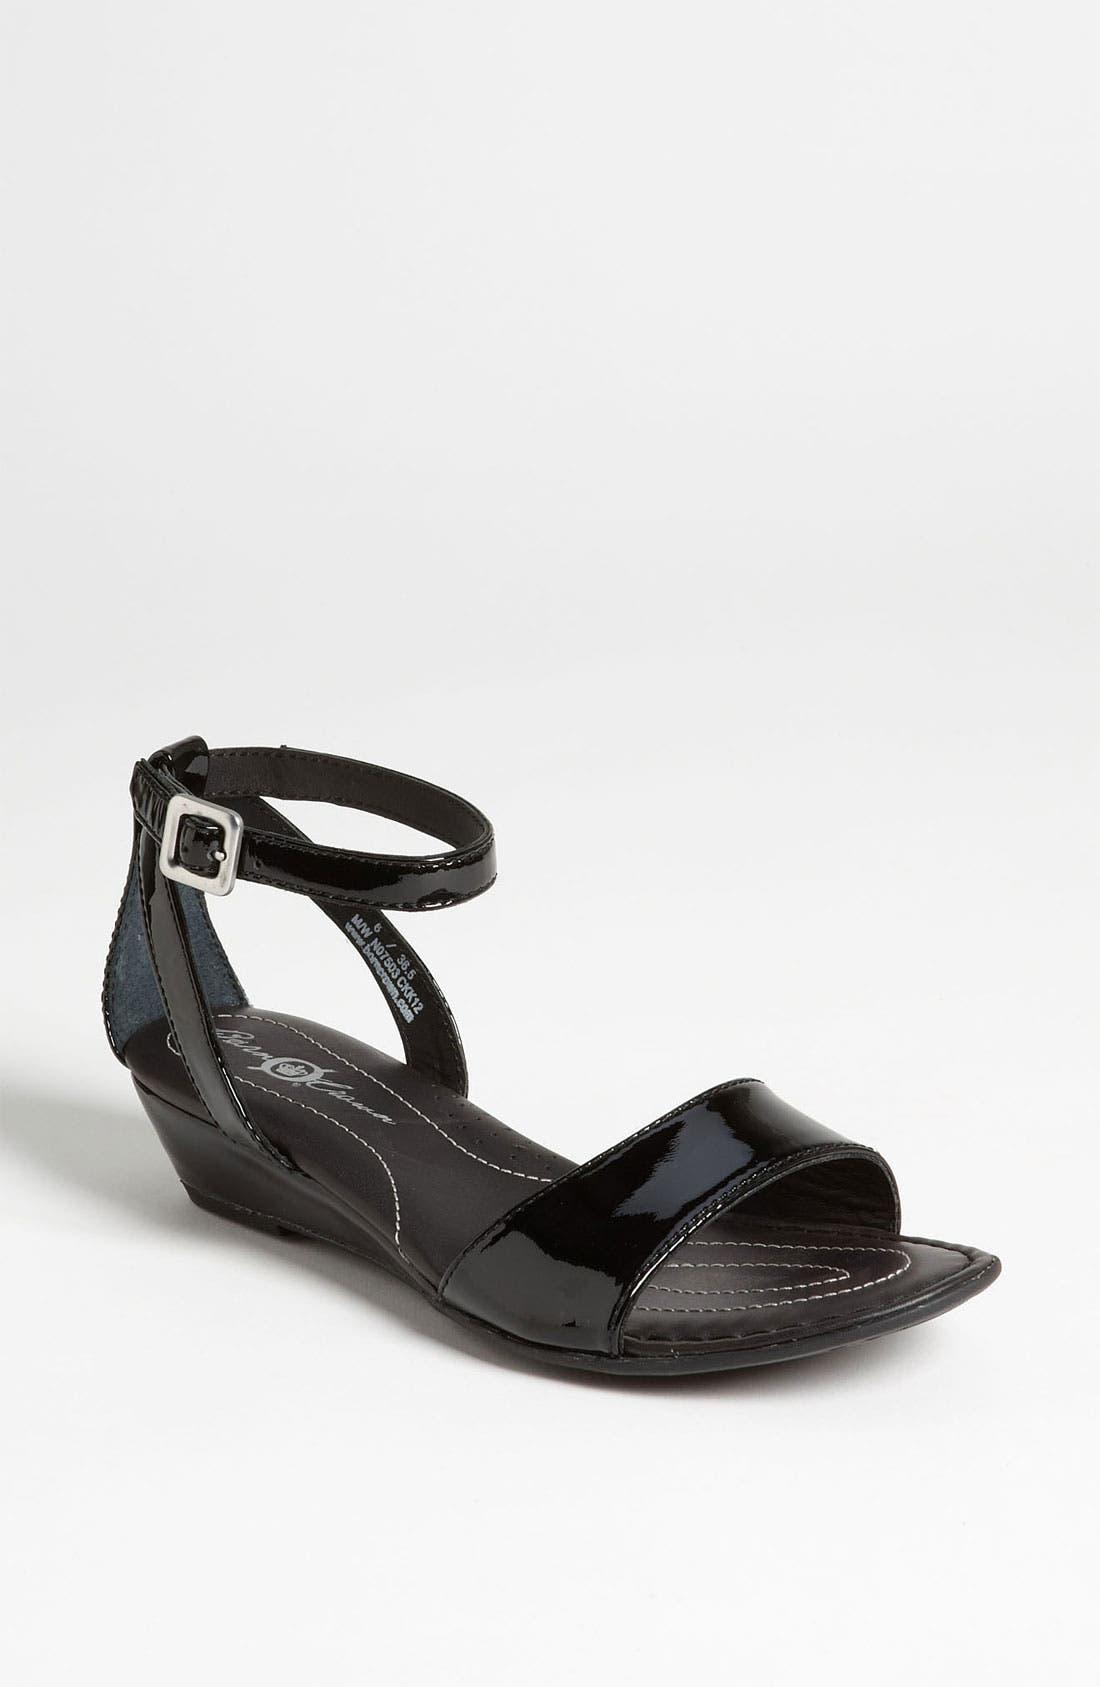 BØRN Crown 'Landis' Sandal, Main, color, 001